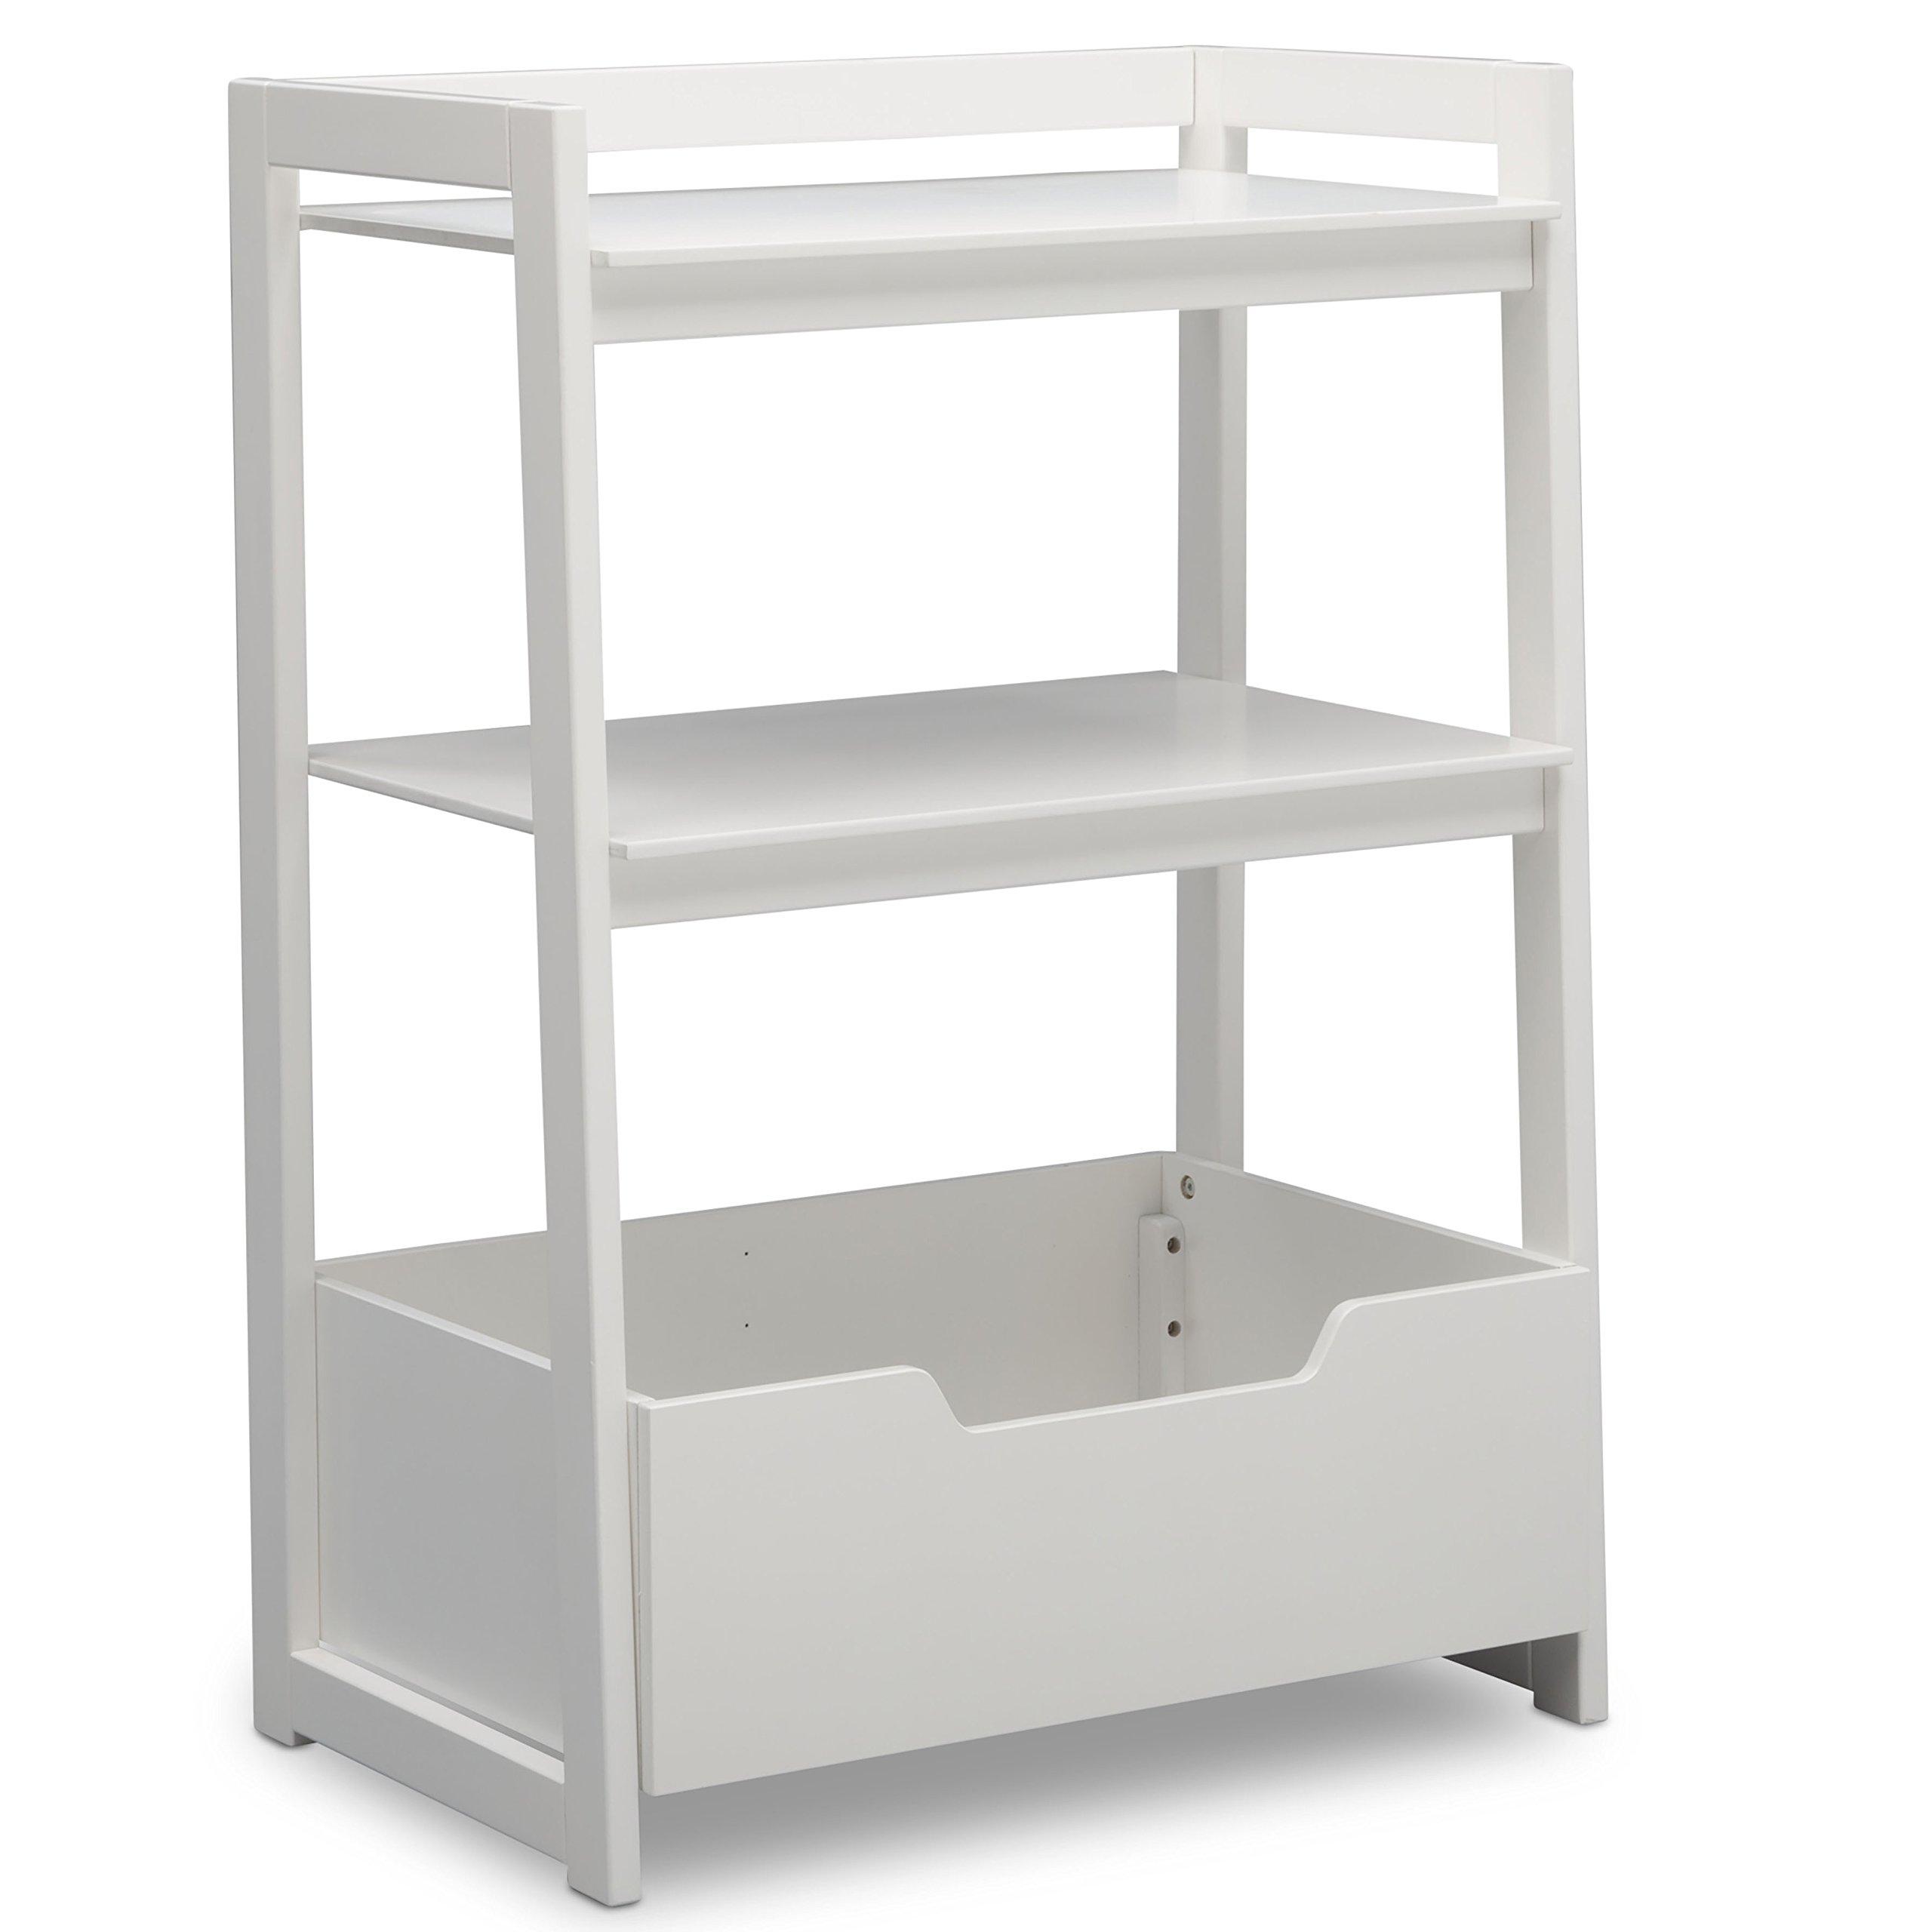 Delta Children Small Ladder Shelf